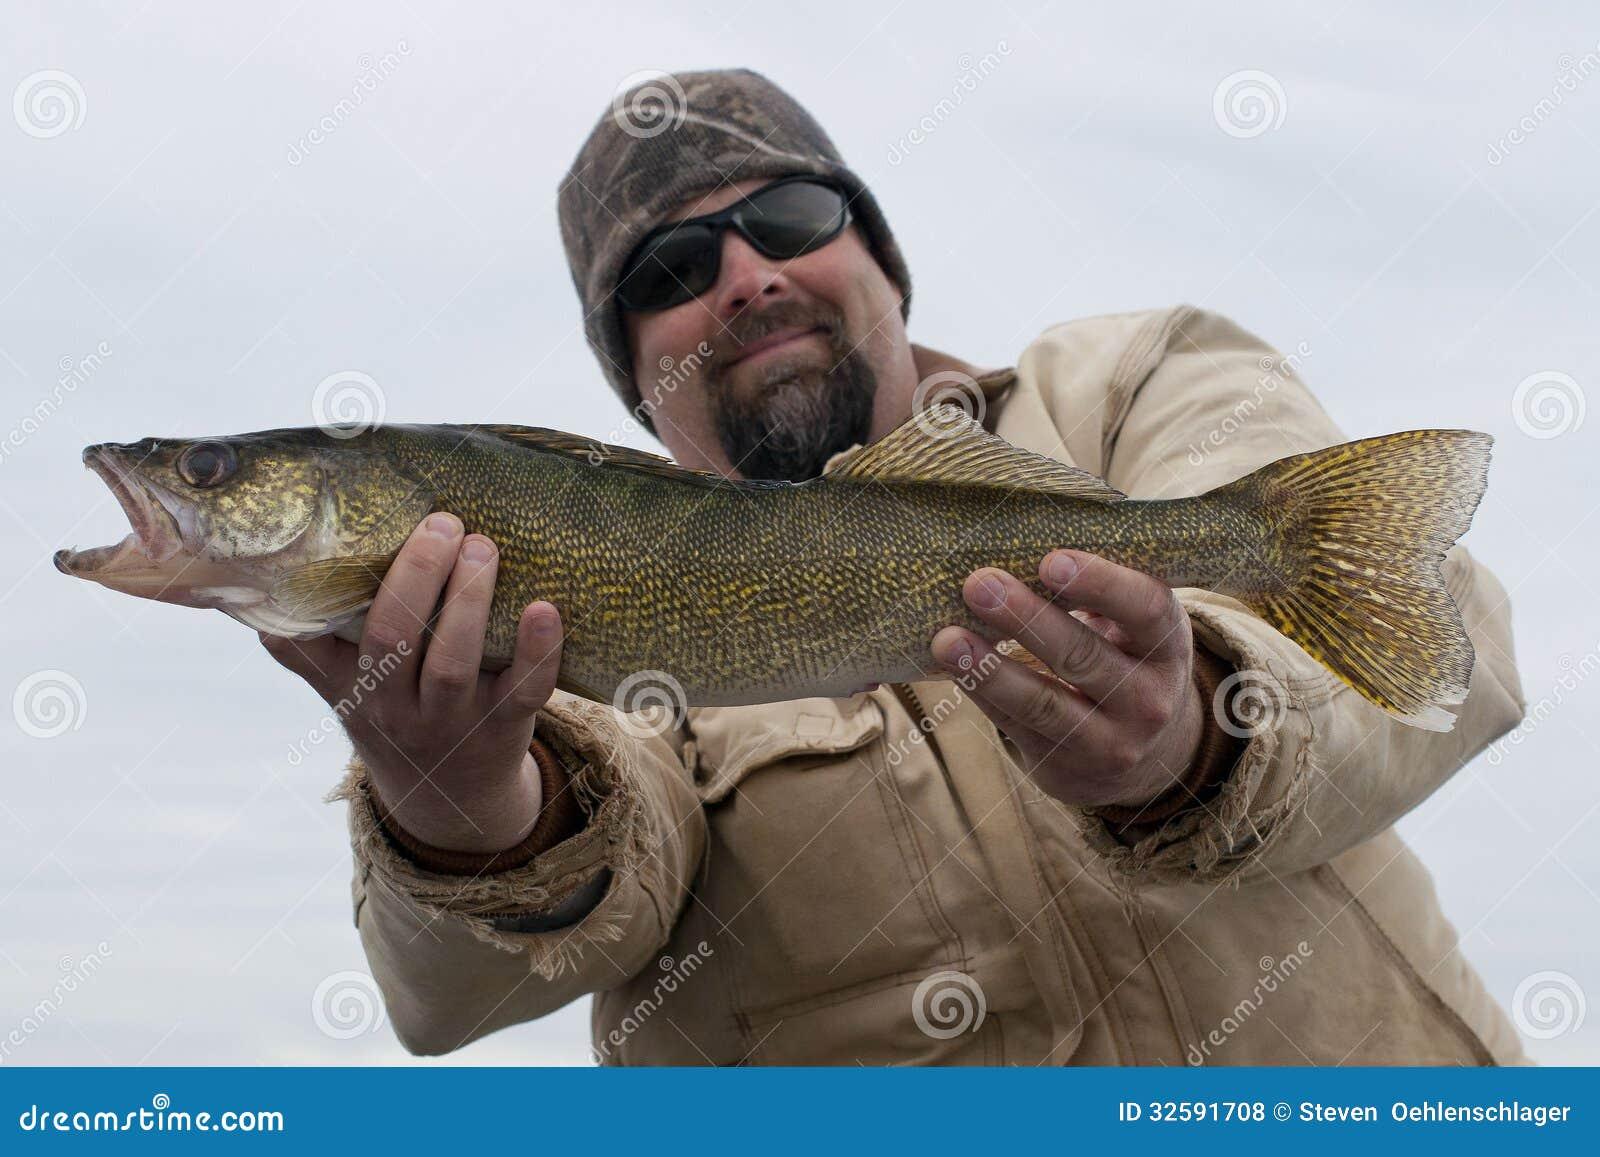 Walleyefiske